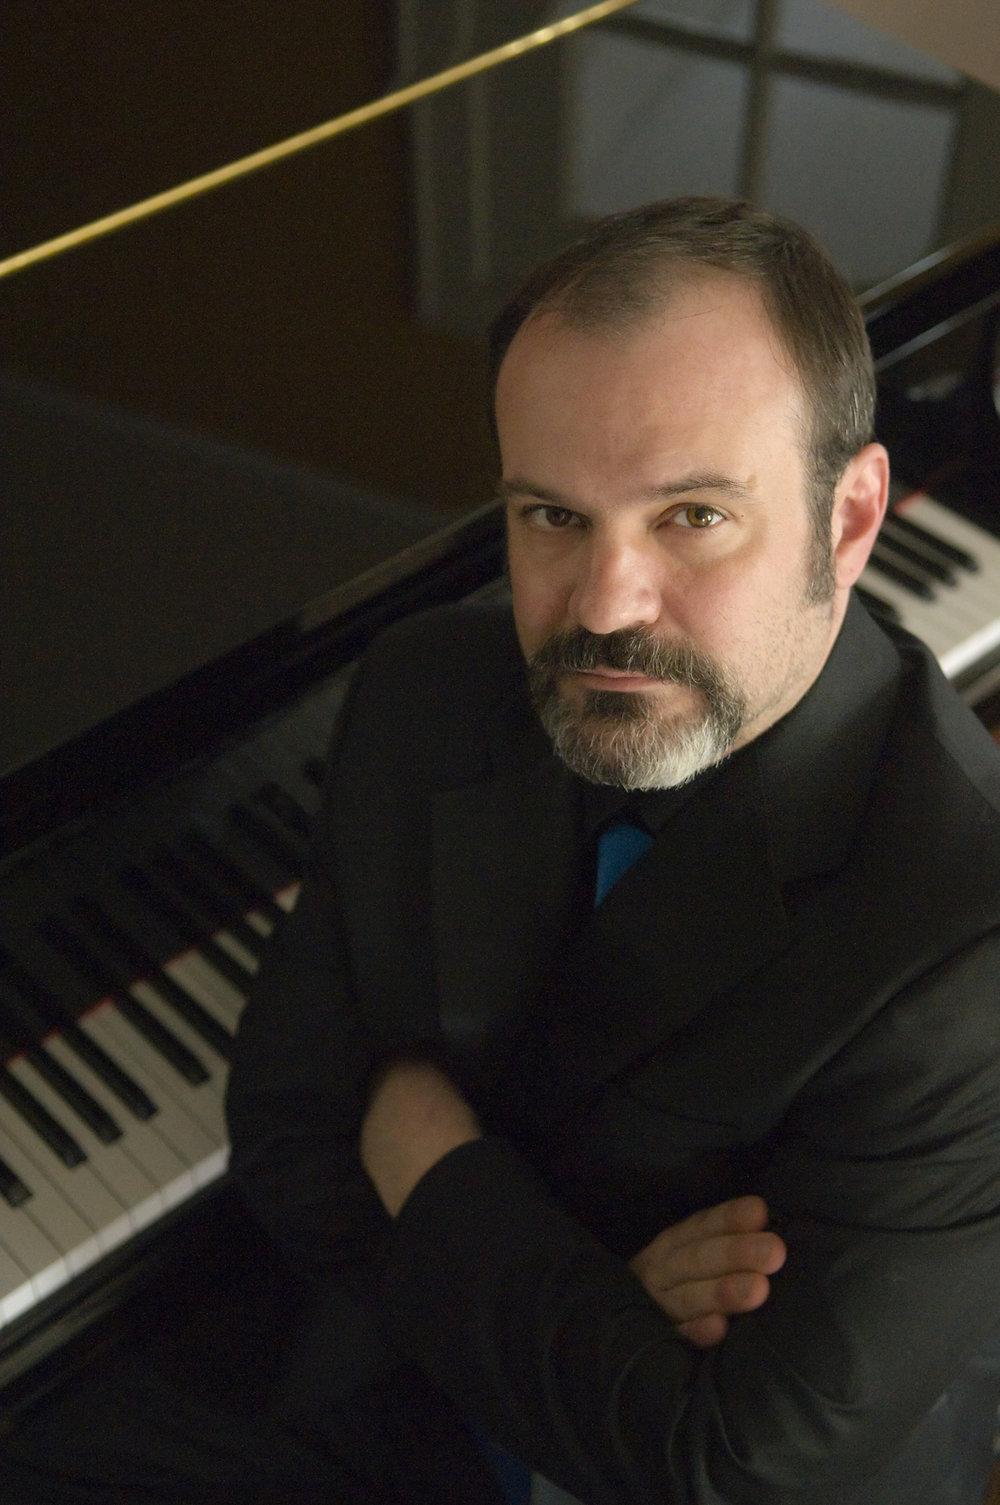 Alan Huckleberry